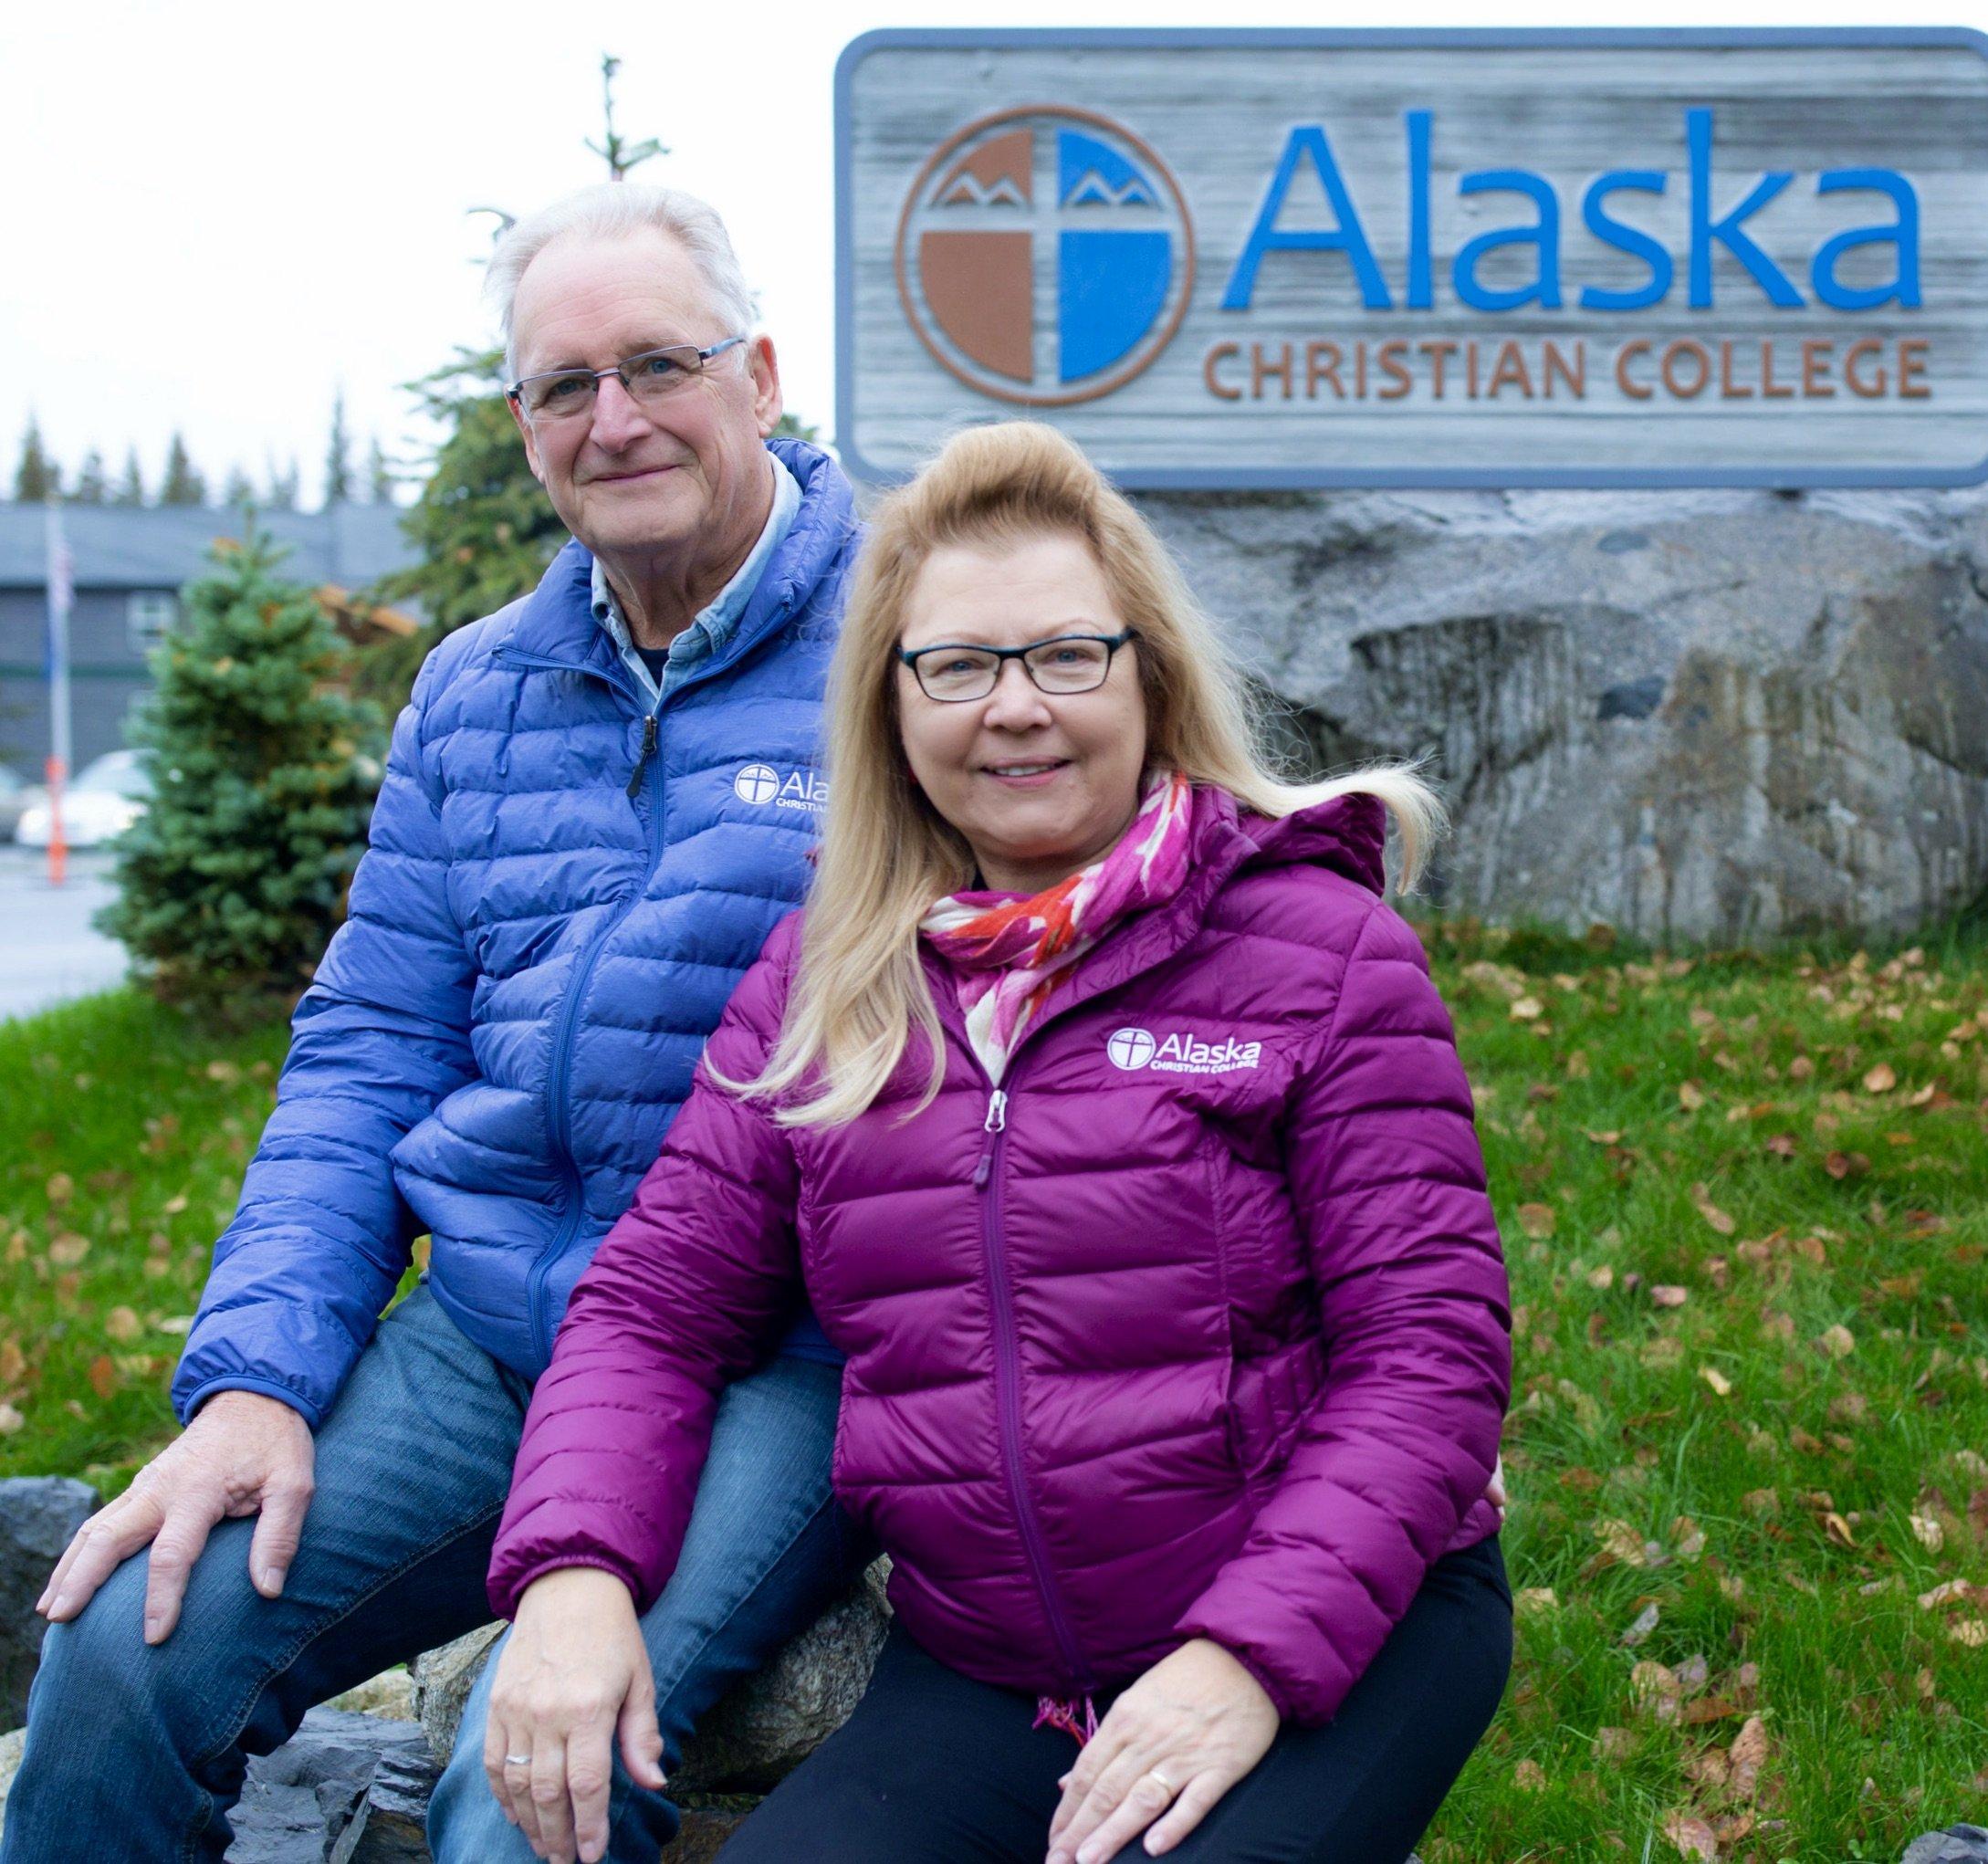 Vonn & Willie VanDorp-Alaska Christian College, YWAM Mission Builders since 2011